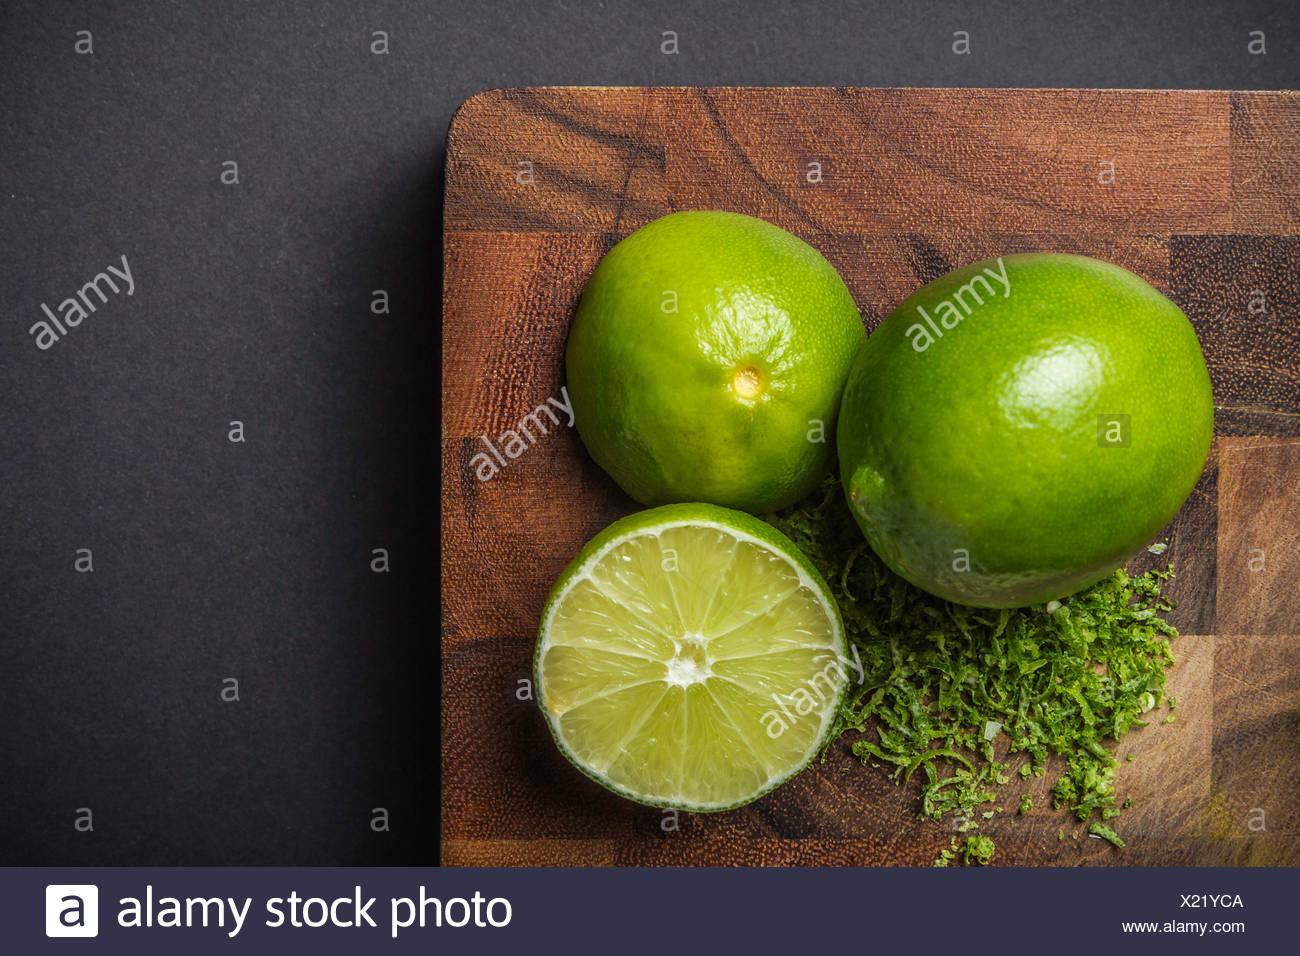 Ingrediente para hacer pasta de curry verde - CAL Imagen De Stock